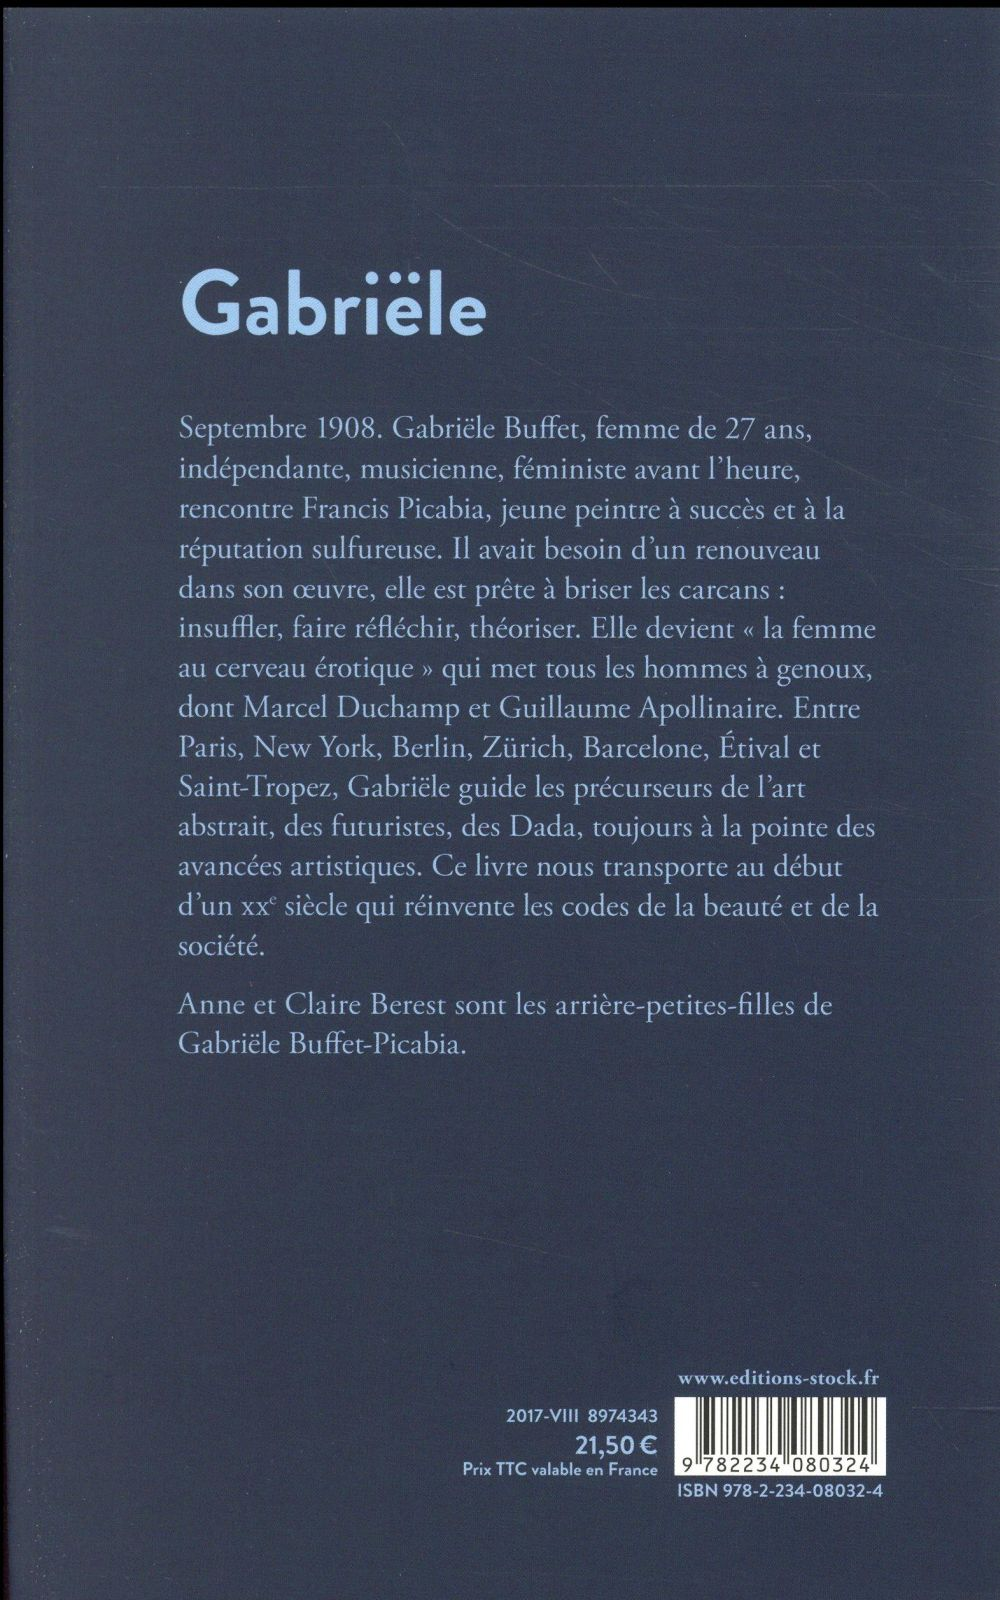 Gabriële